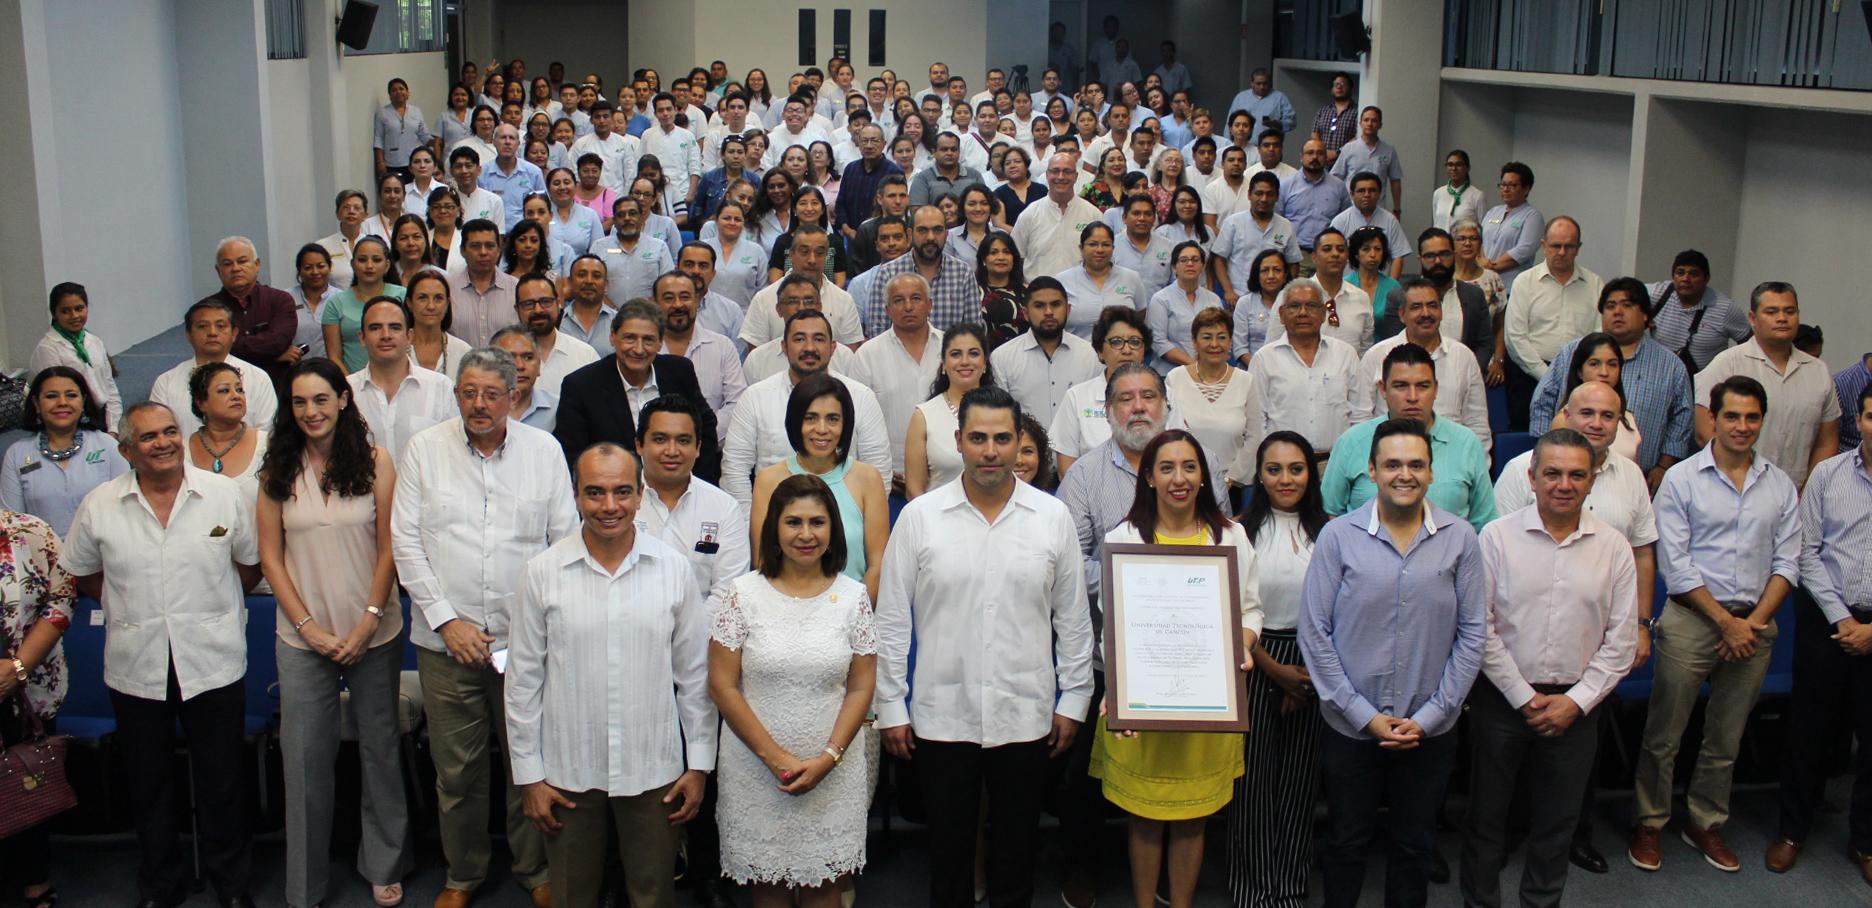 Presentación Oficial del Modelo BIS UT Cancún